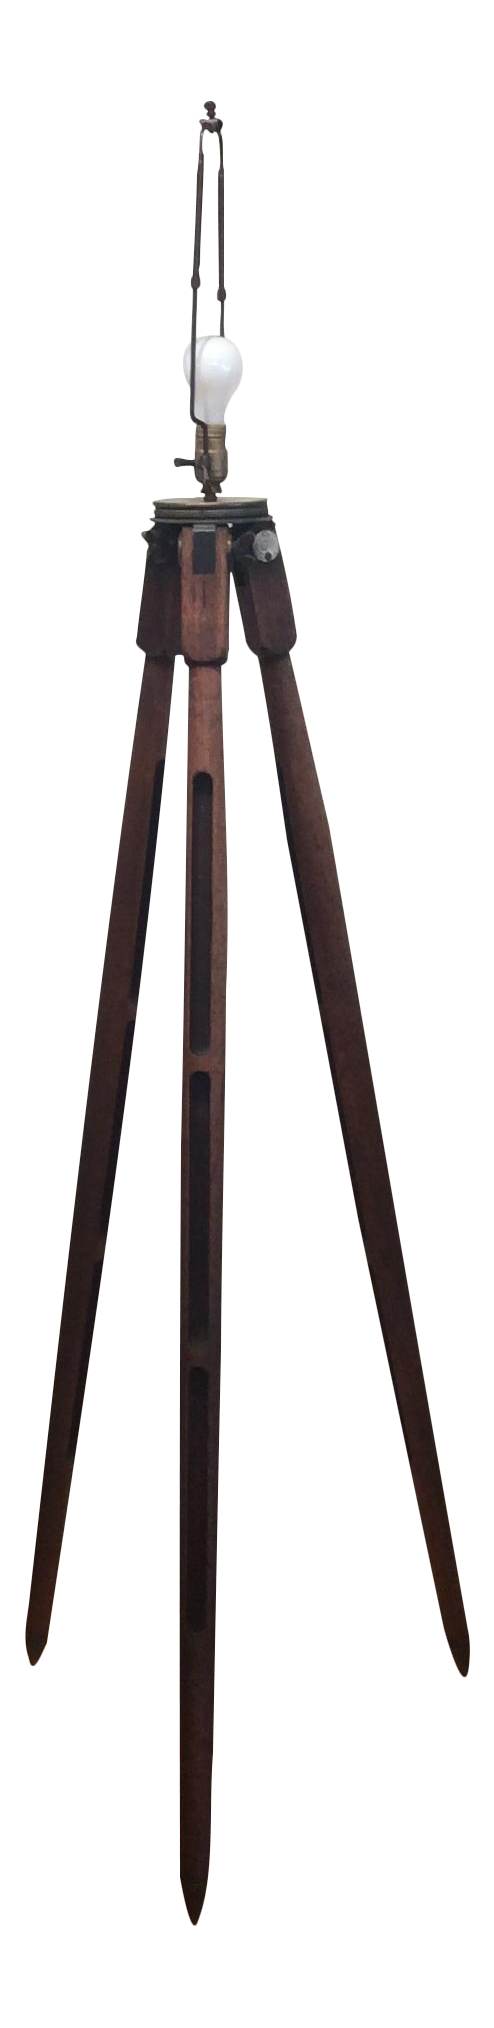 Vintage surveyors tripod floor lamp chairish for Surveyors floor lamp wood